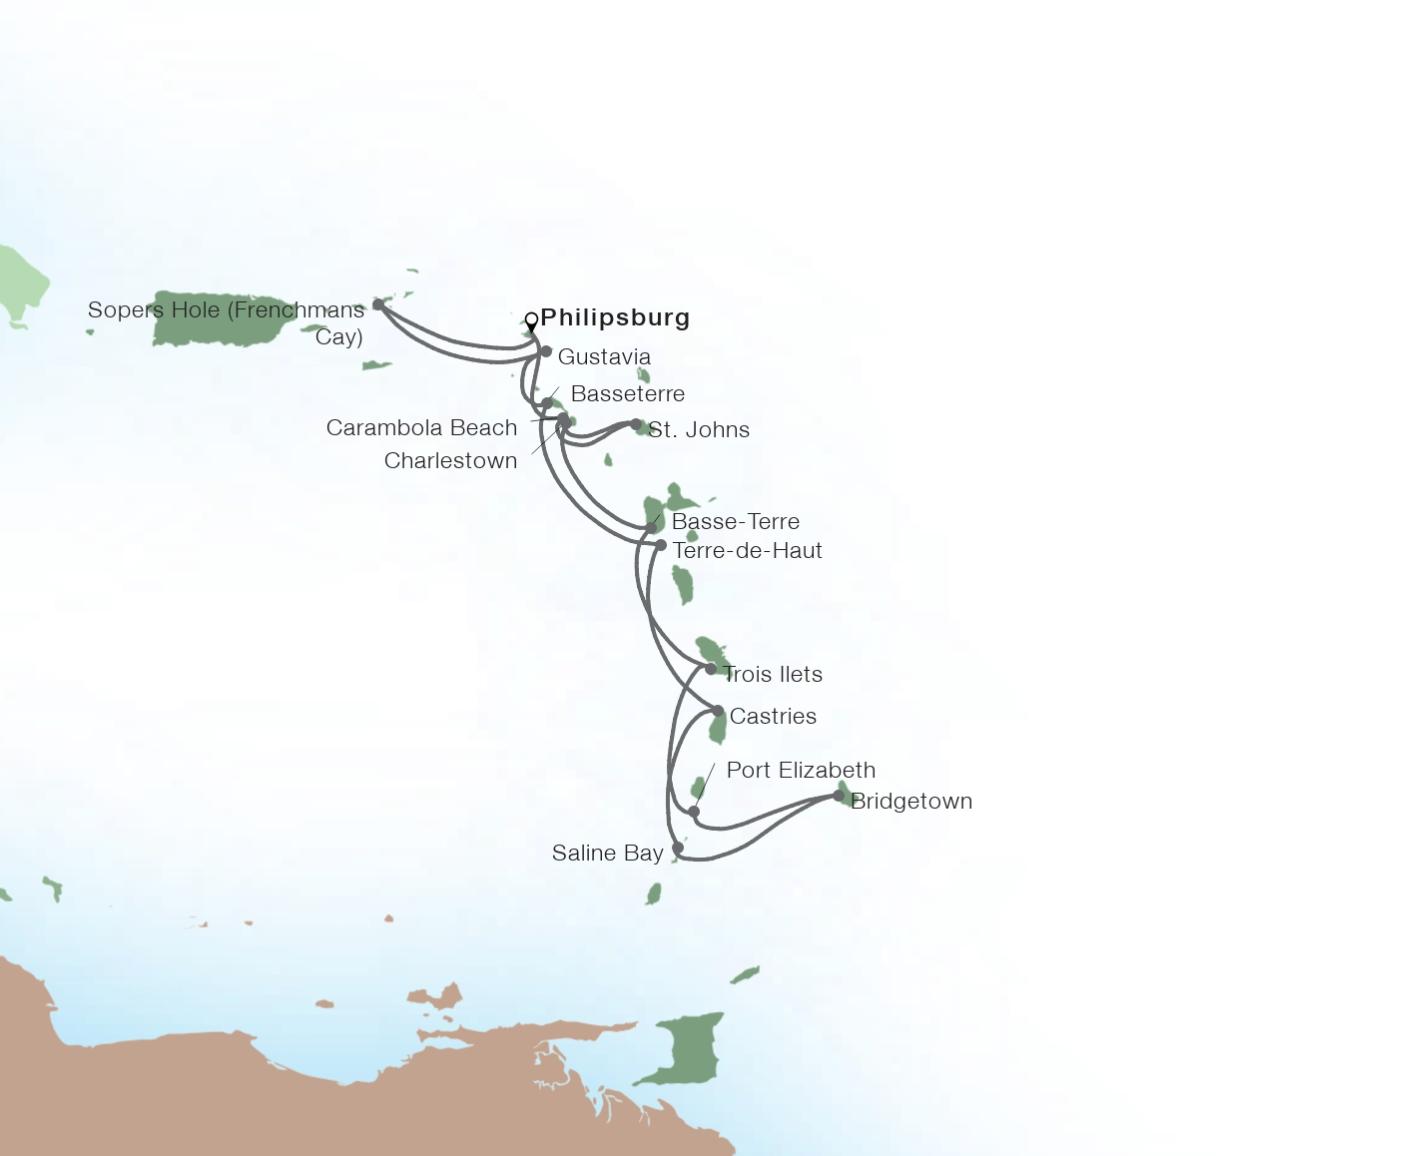 14-Day Caribbean Gems In-Depth - SEABOURN ODYSSEYPhilipsburg, Sint Maarten to Philipsburg, Sint Maarten